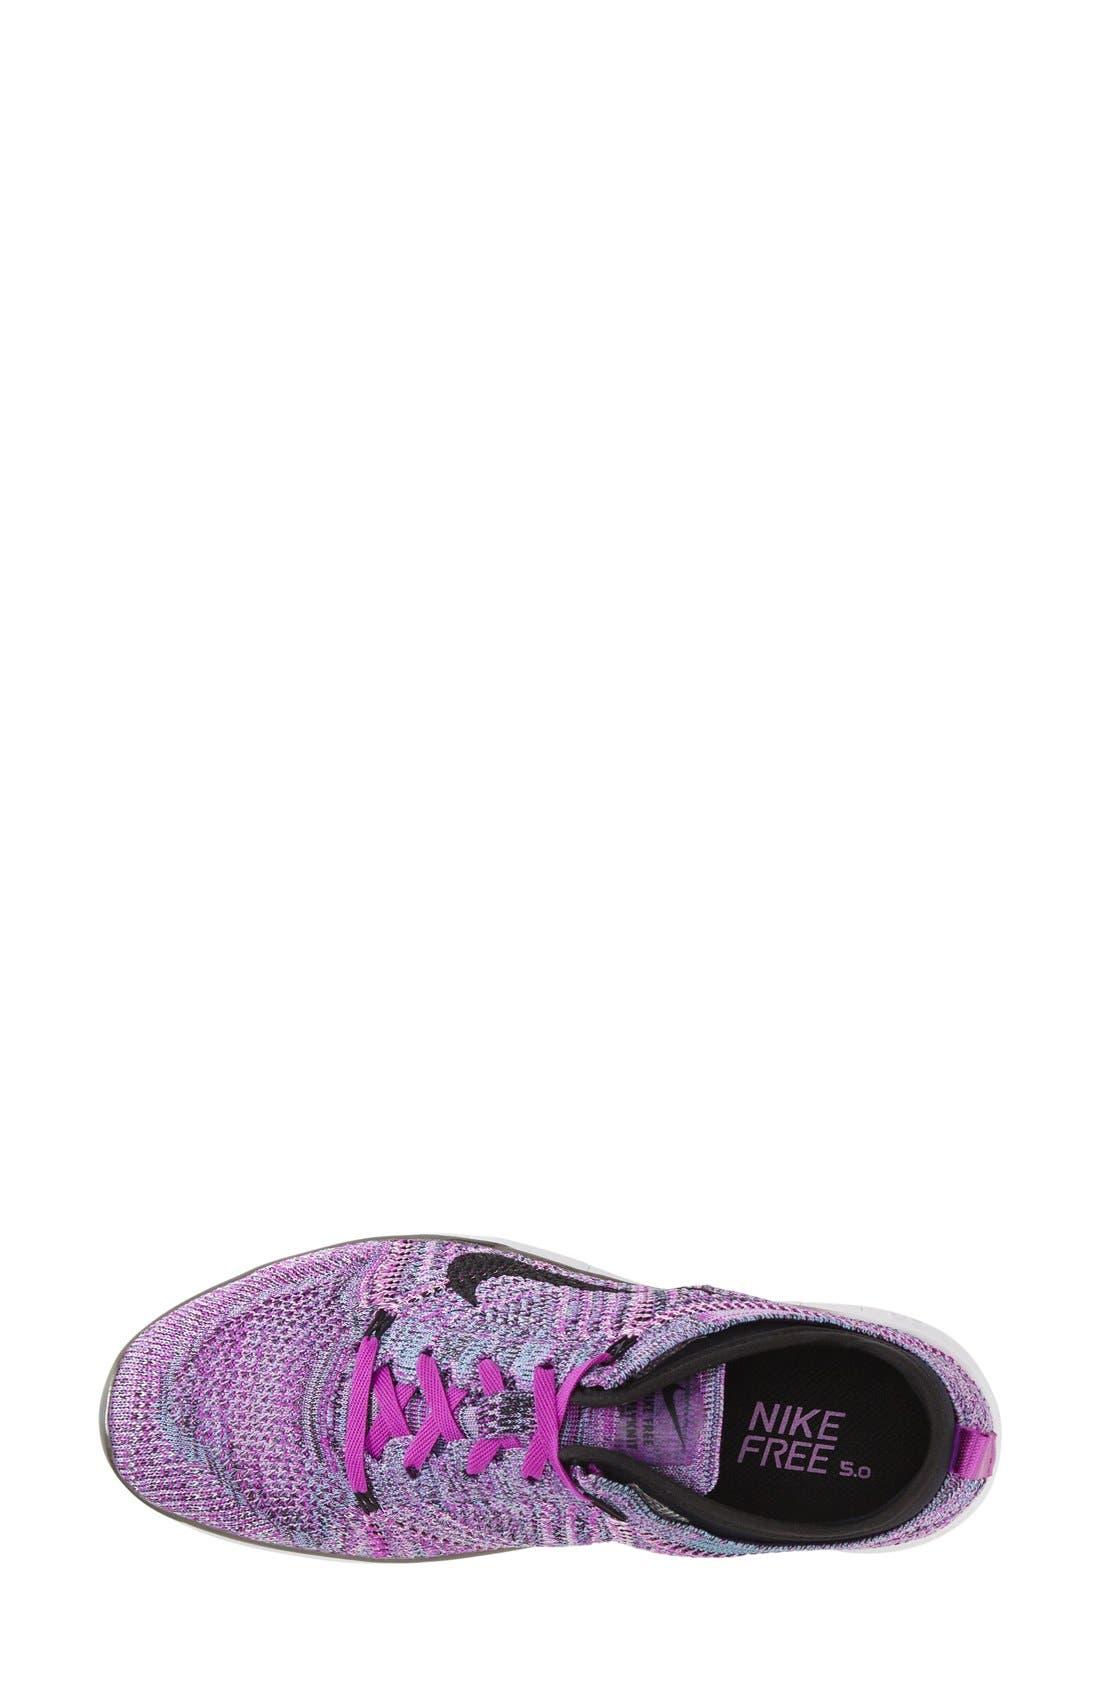 ,                             'Free Flyknit 5.0 TR' Training Shoe,                             Alternate thumbnail 47, color,                             599